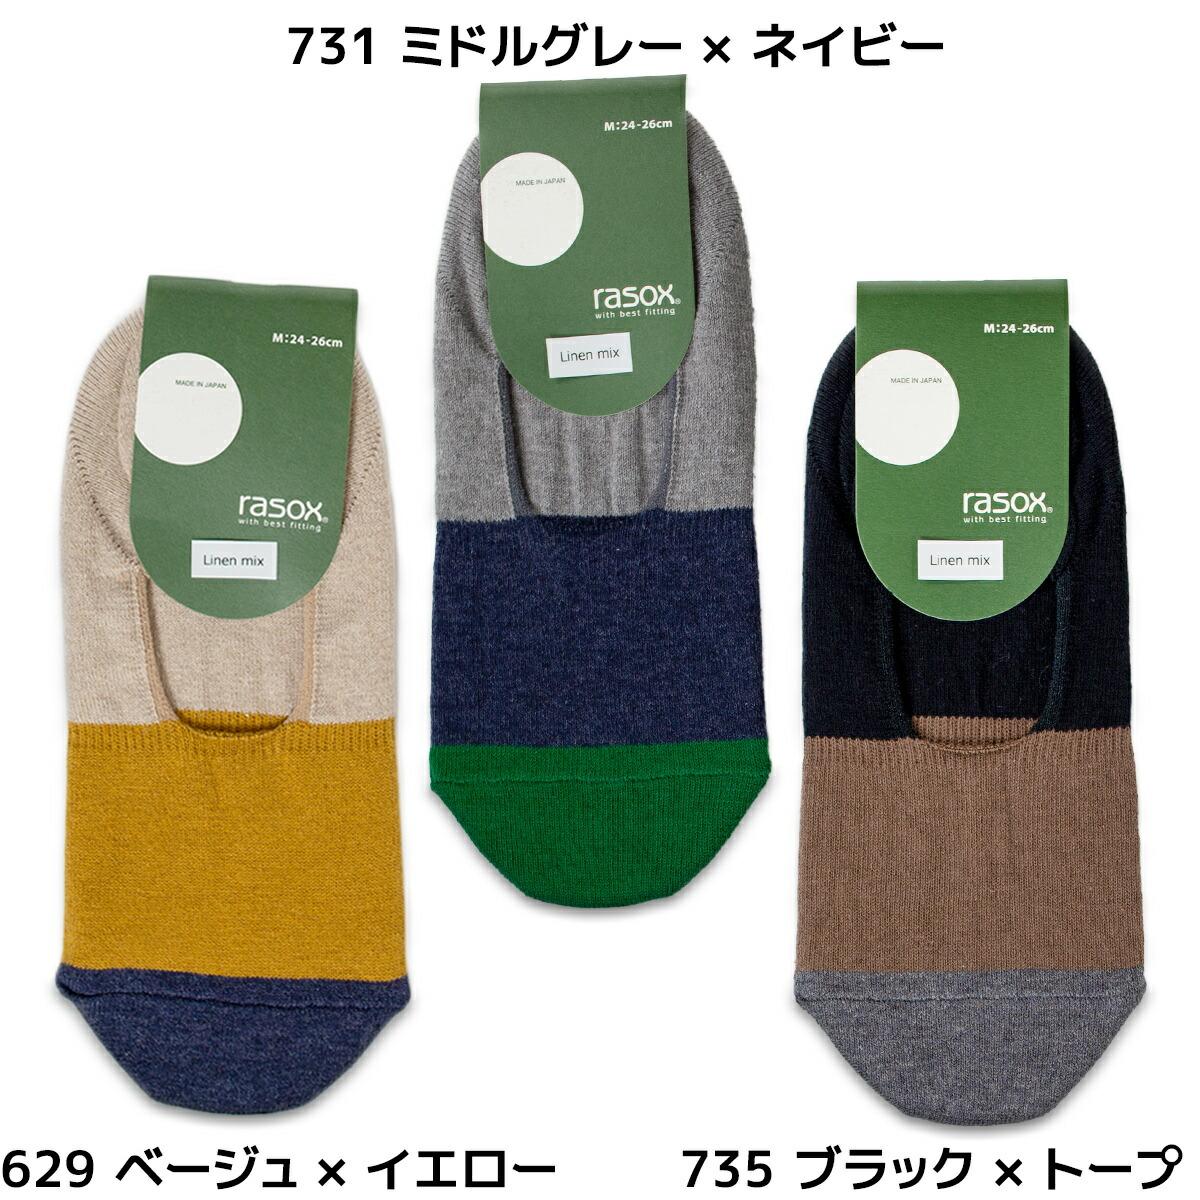 rasox/ラソックス/靴下/カバーソックス/フットカバー/コットンリネンカバー/カラーバリエーション3